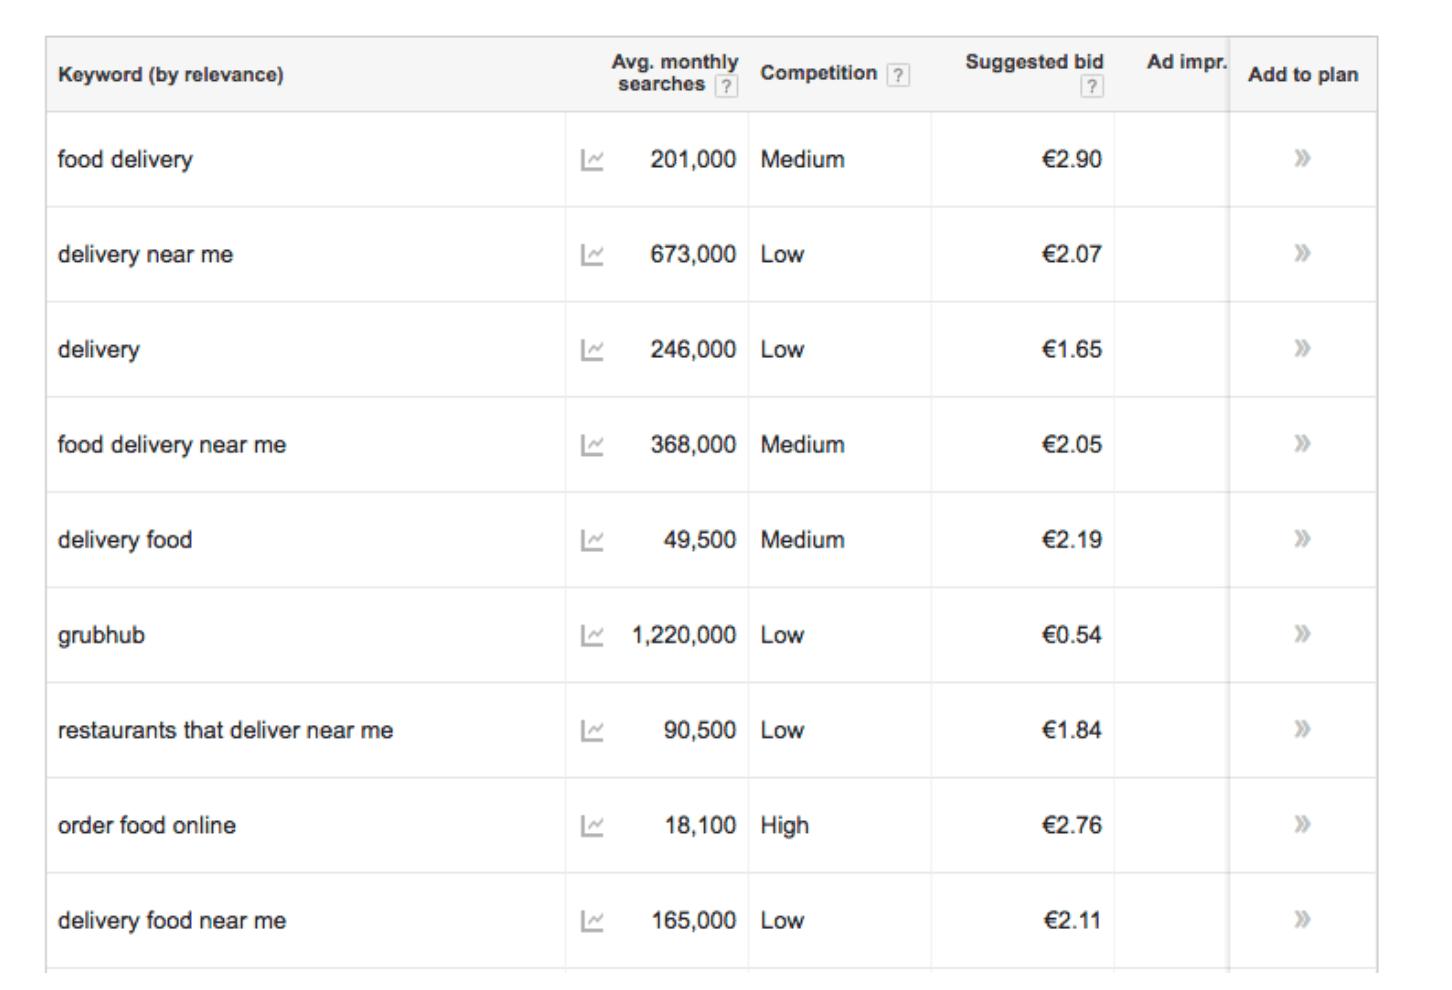 Screenshot of the Google Keyword Planner Tool